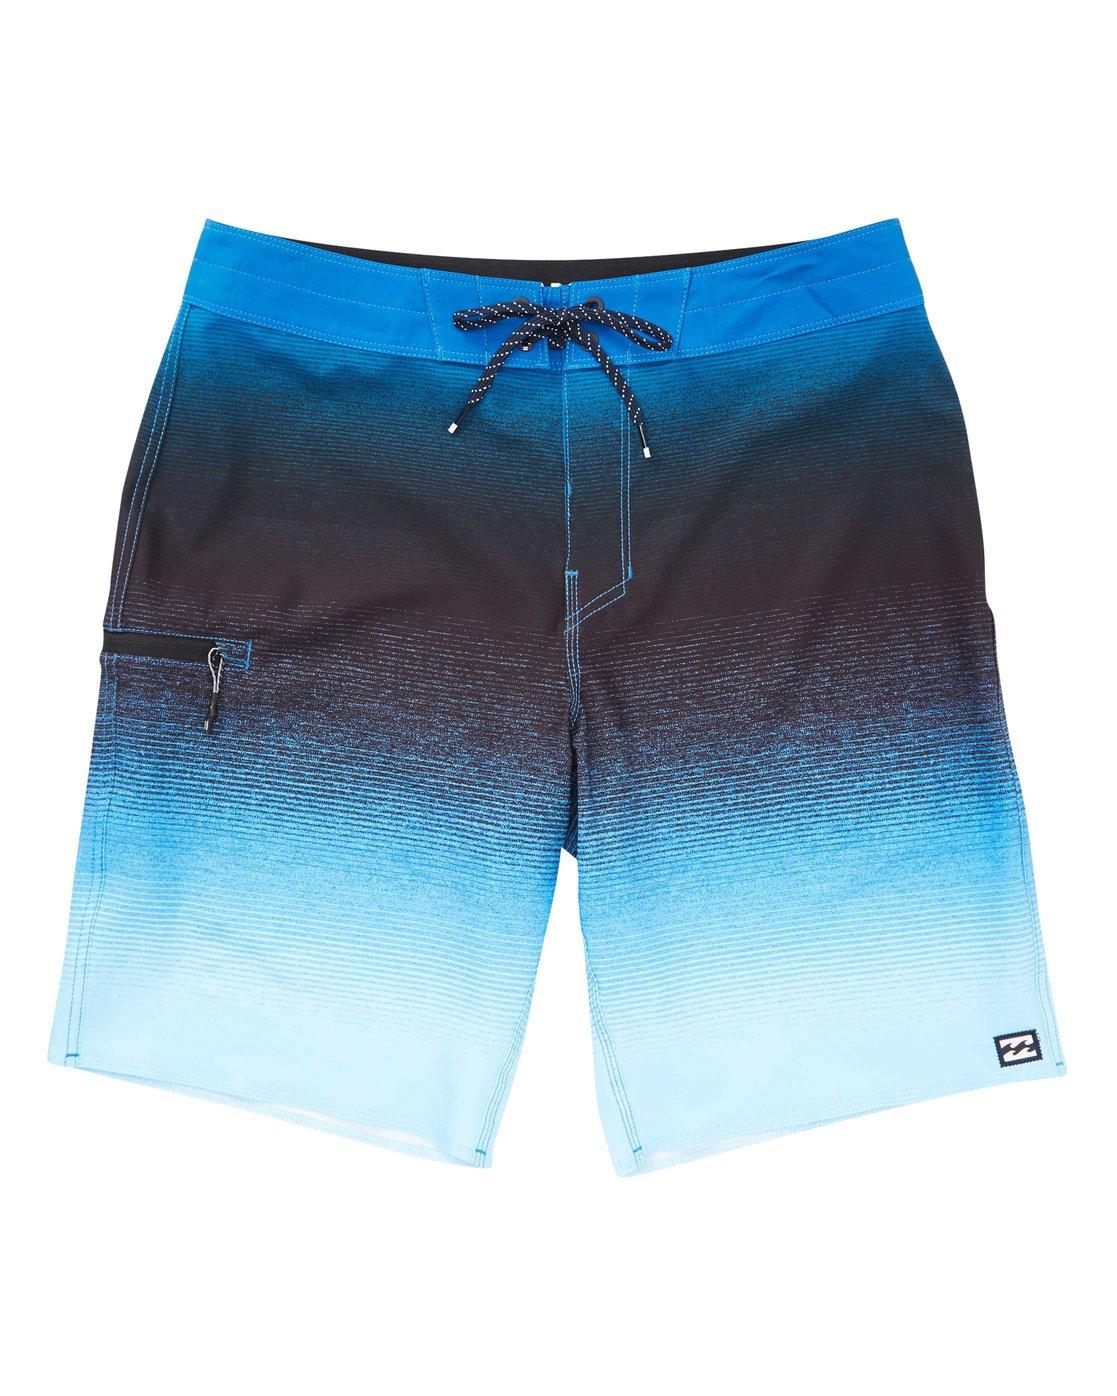 07947318f3 0 Fluid Airlite Boardshorts Blue M104TBFL Billabong